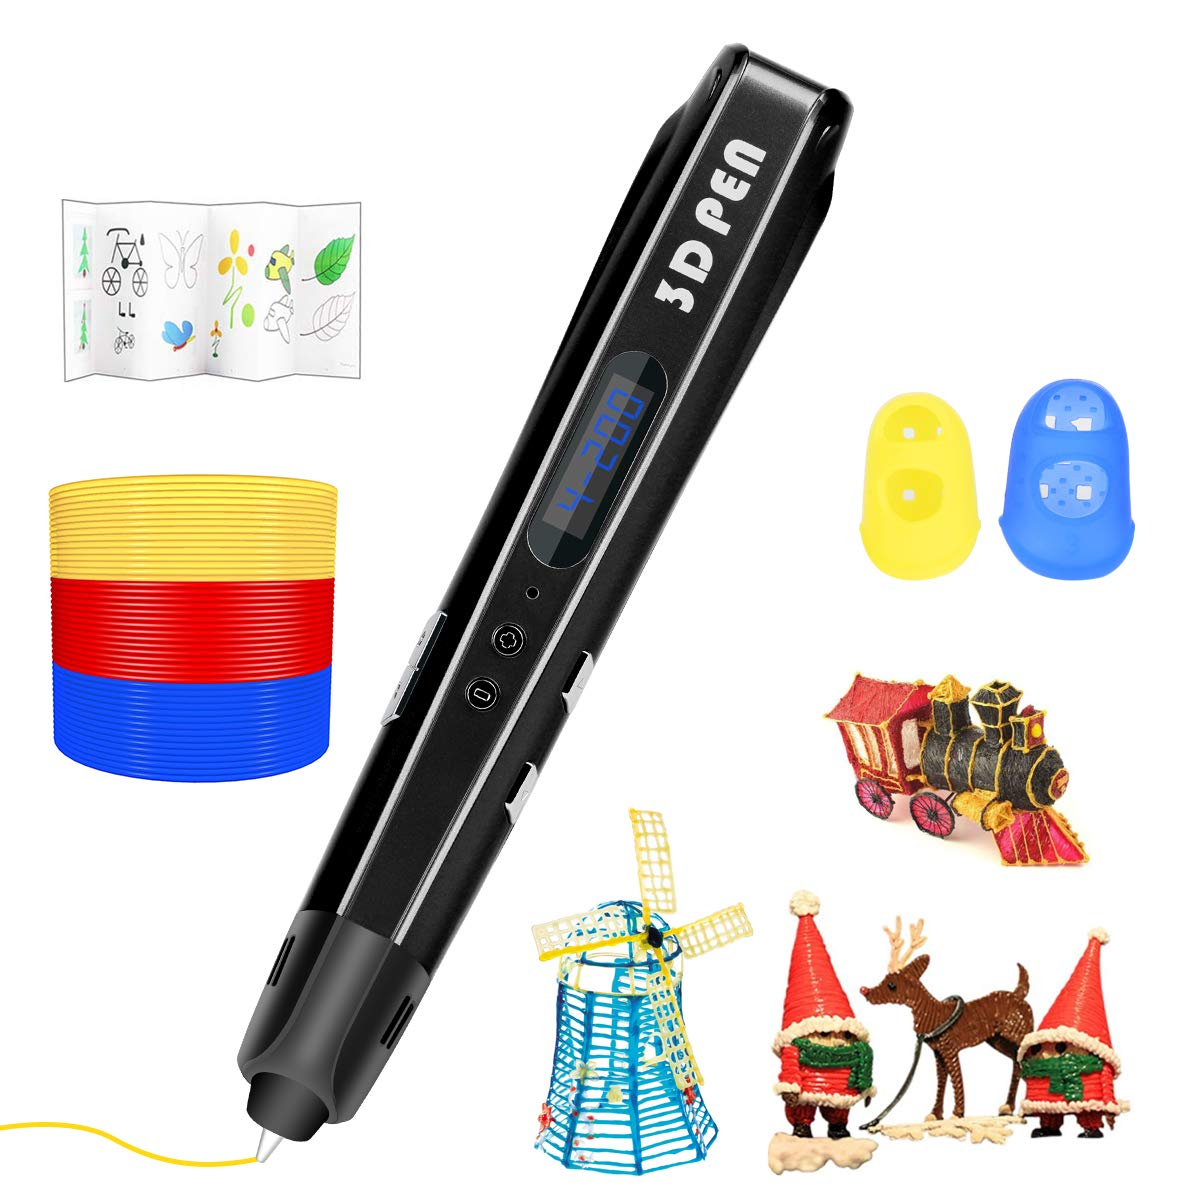 3D Pen 3D Printing Pen Adults DIY Blue Drawing 3D Printer Pen Artist 3D Pen Friends Compatible with PLA Filament,Doodling 3D Drawing Pen for Kids